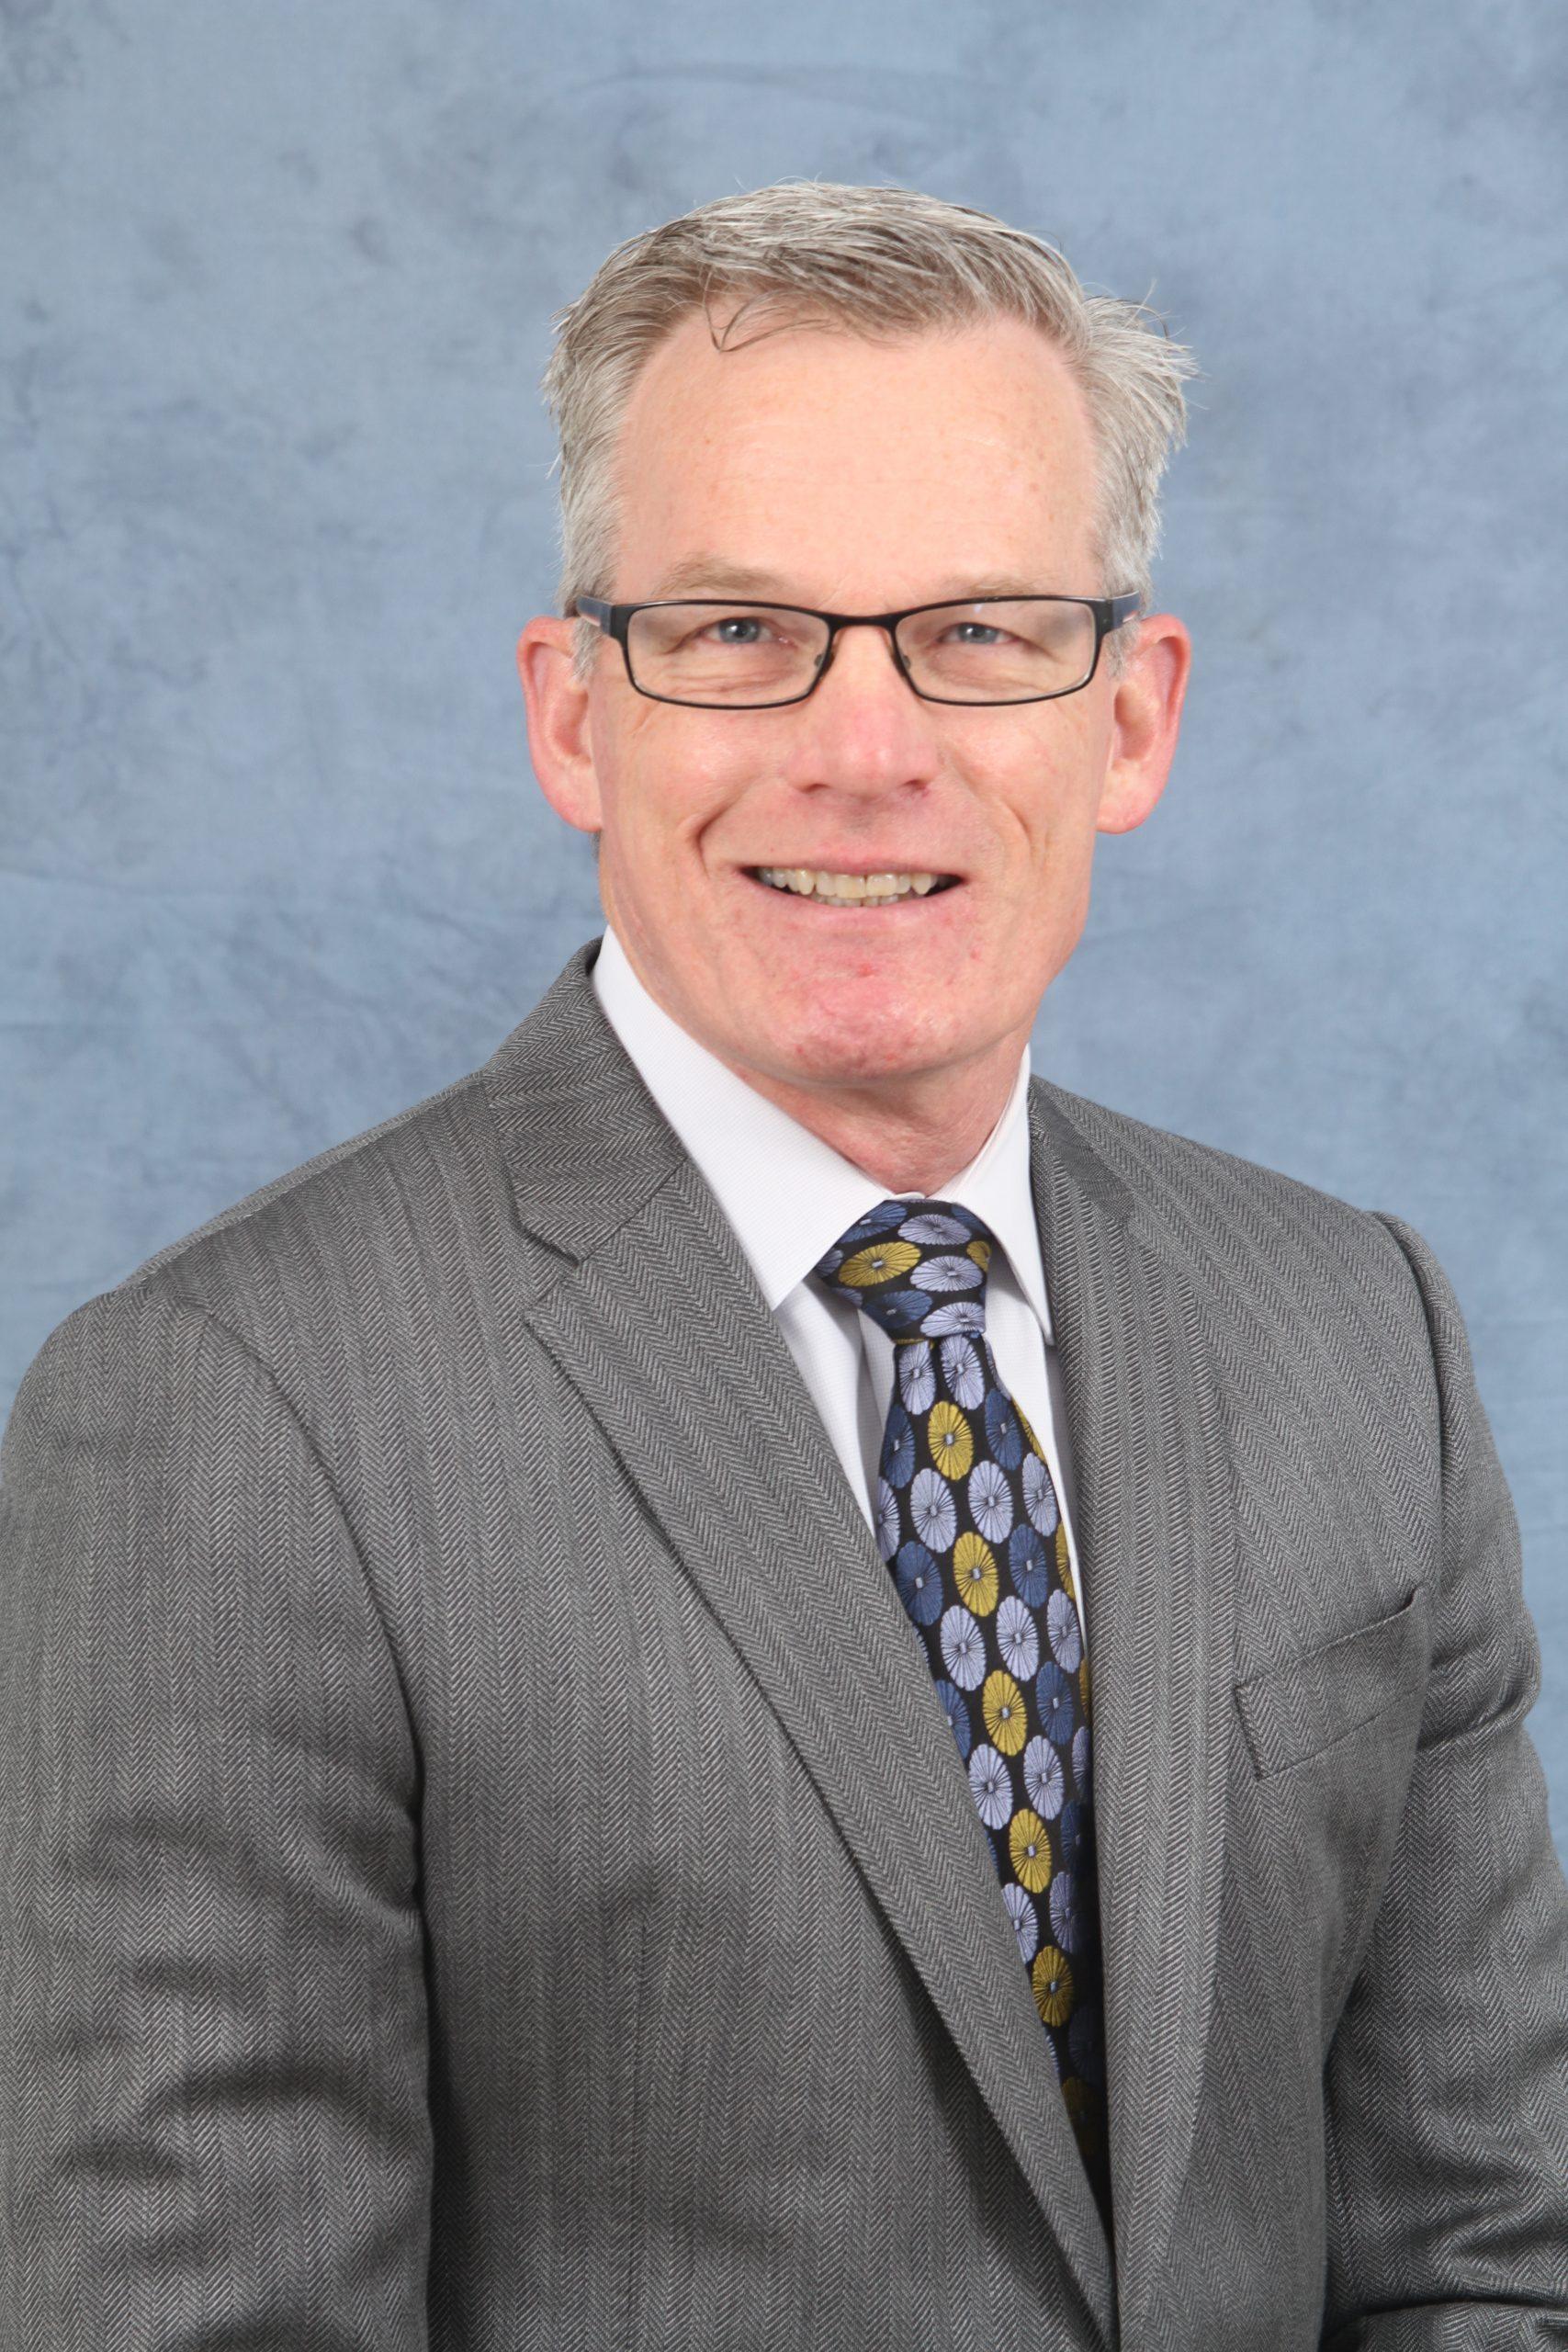 Daniel F. McCann